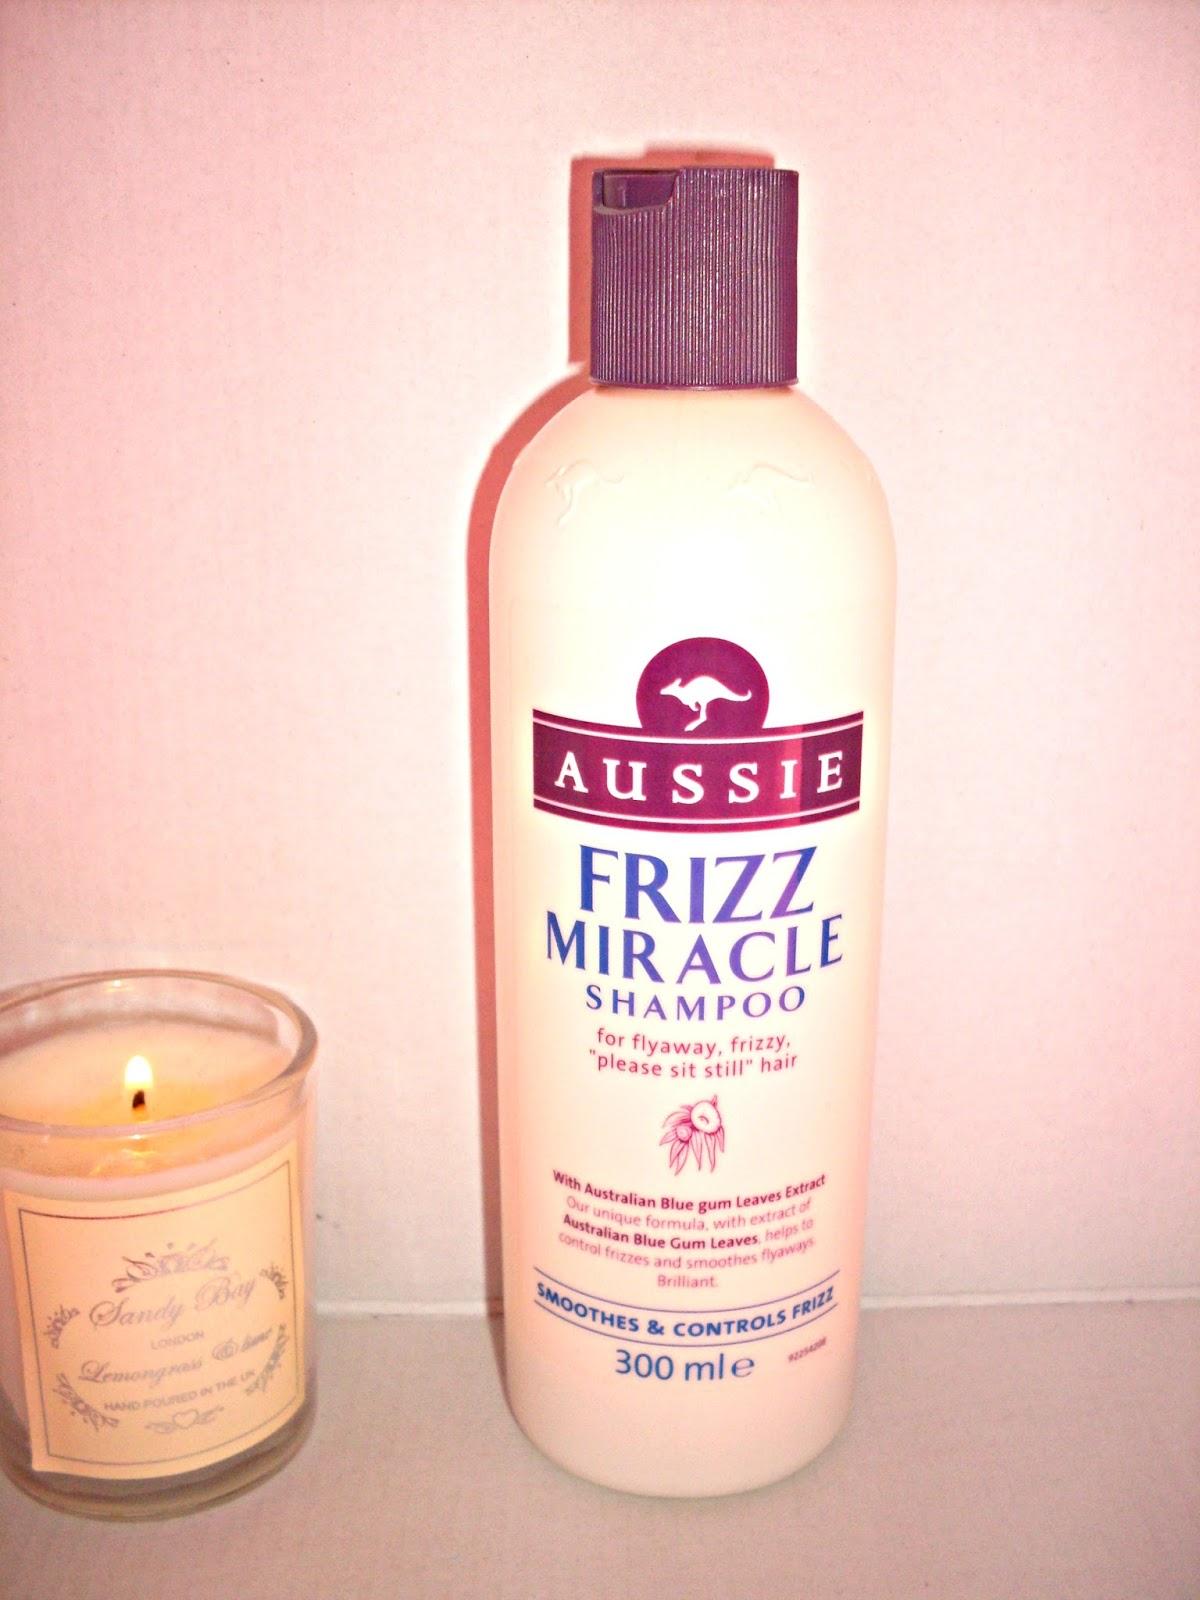 Aussie Frizz Miracle Shampoo